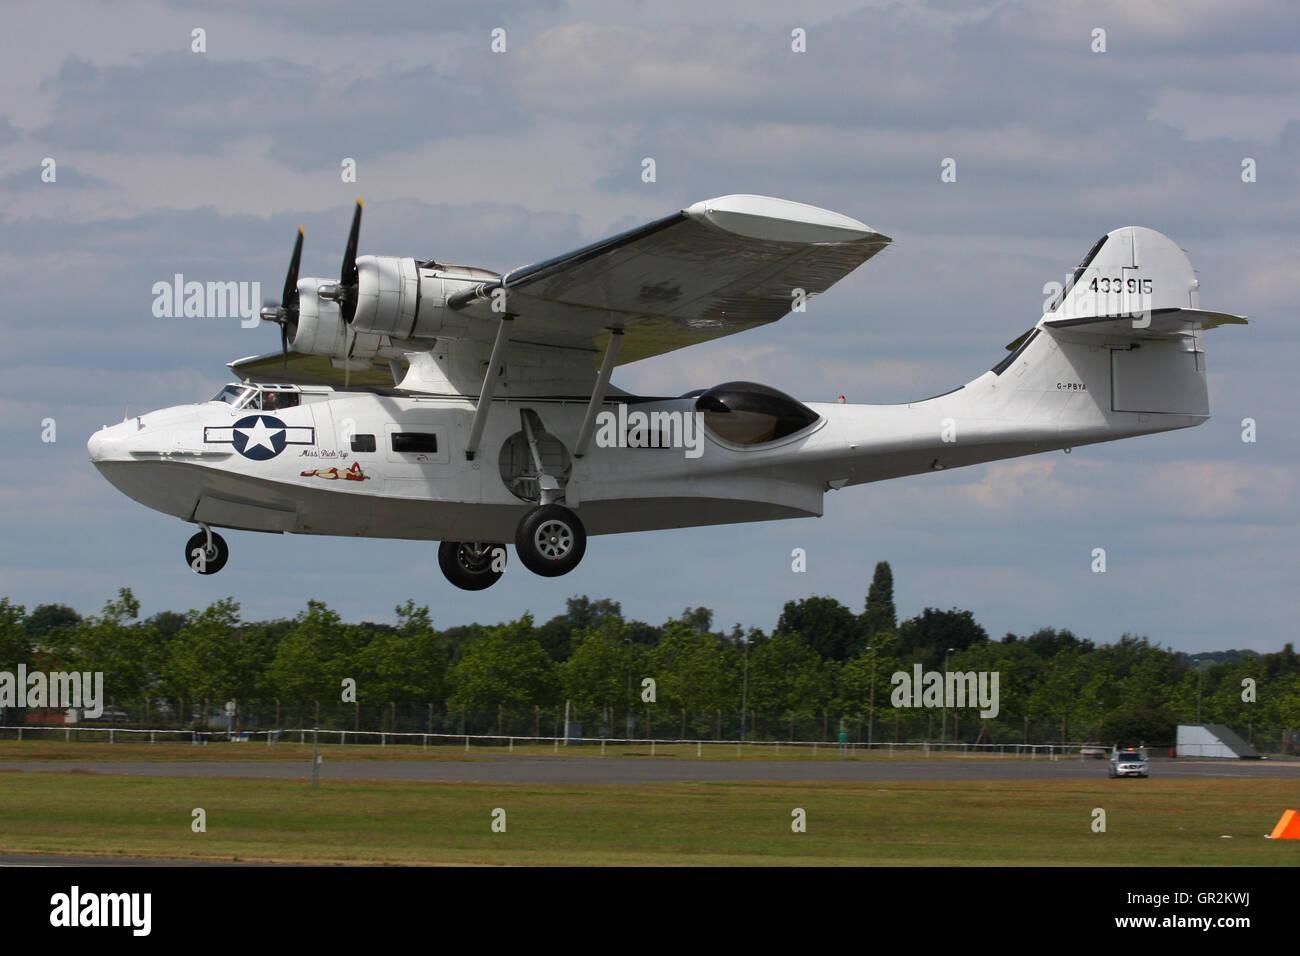 CATALINA PBY FLYING BOAT - Stock Image